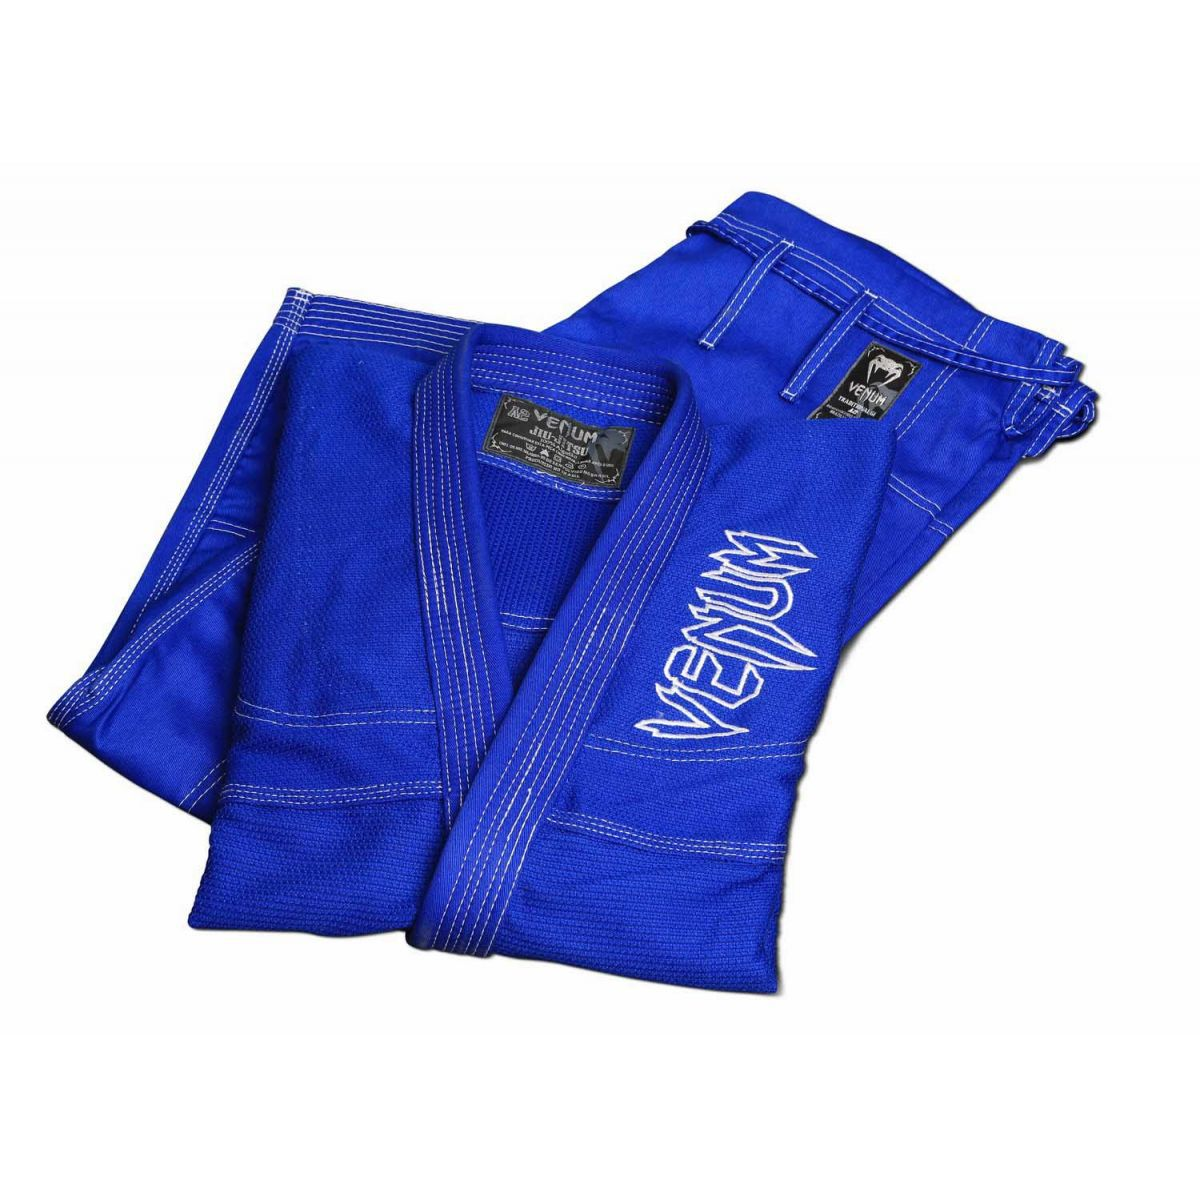 Kimono Jiu Jitsu - Competition Brasil  - Trancado - Venum - Azul .  - Loja do Competidor